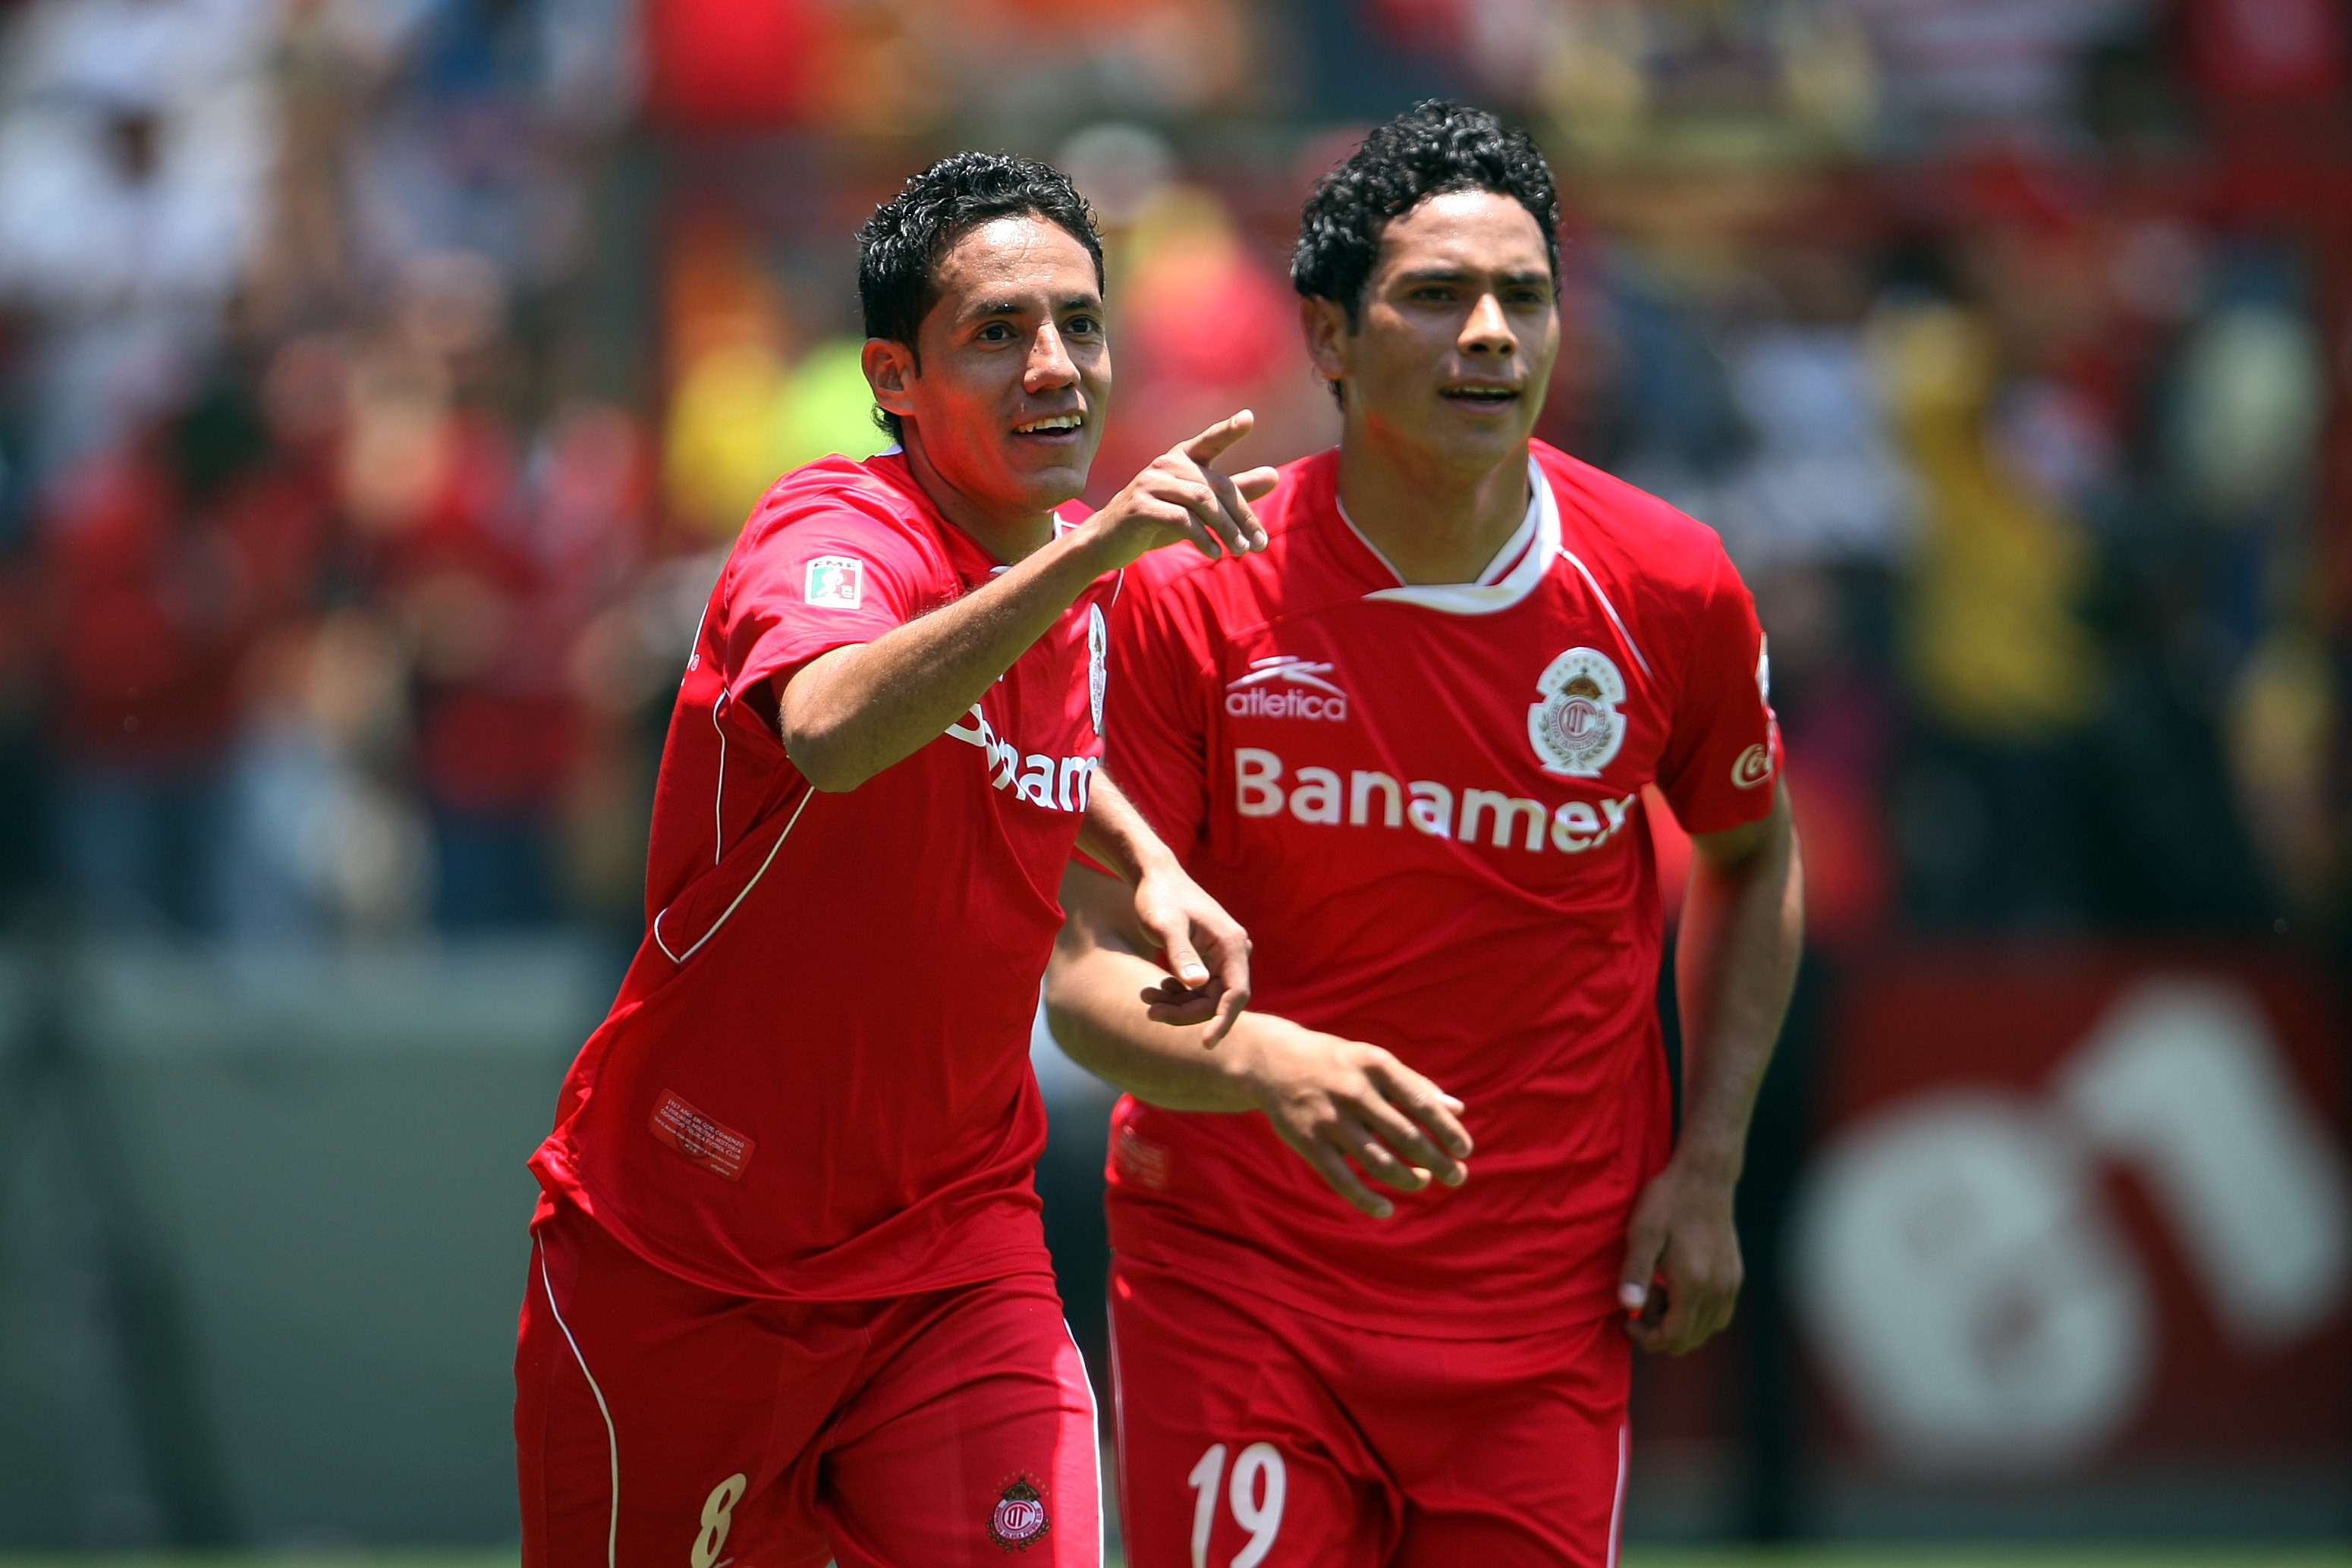 Raúl Nava, Toluca, Liga Guatemala, Deportivo Iztapa